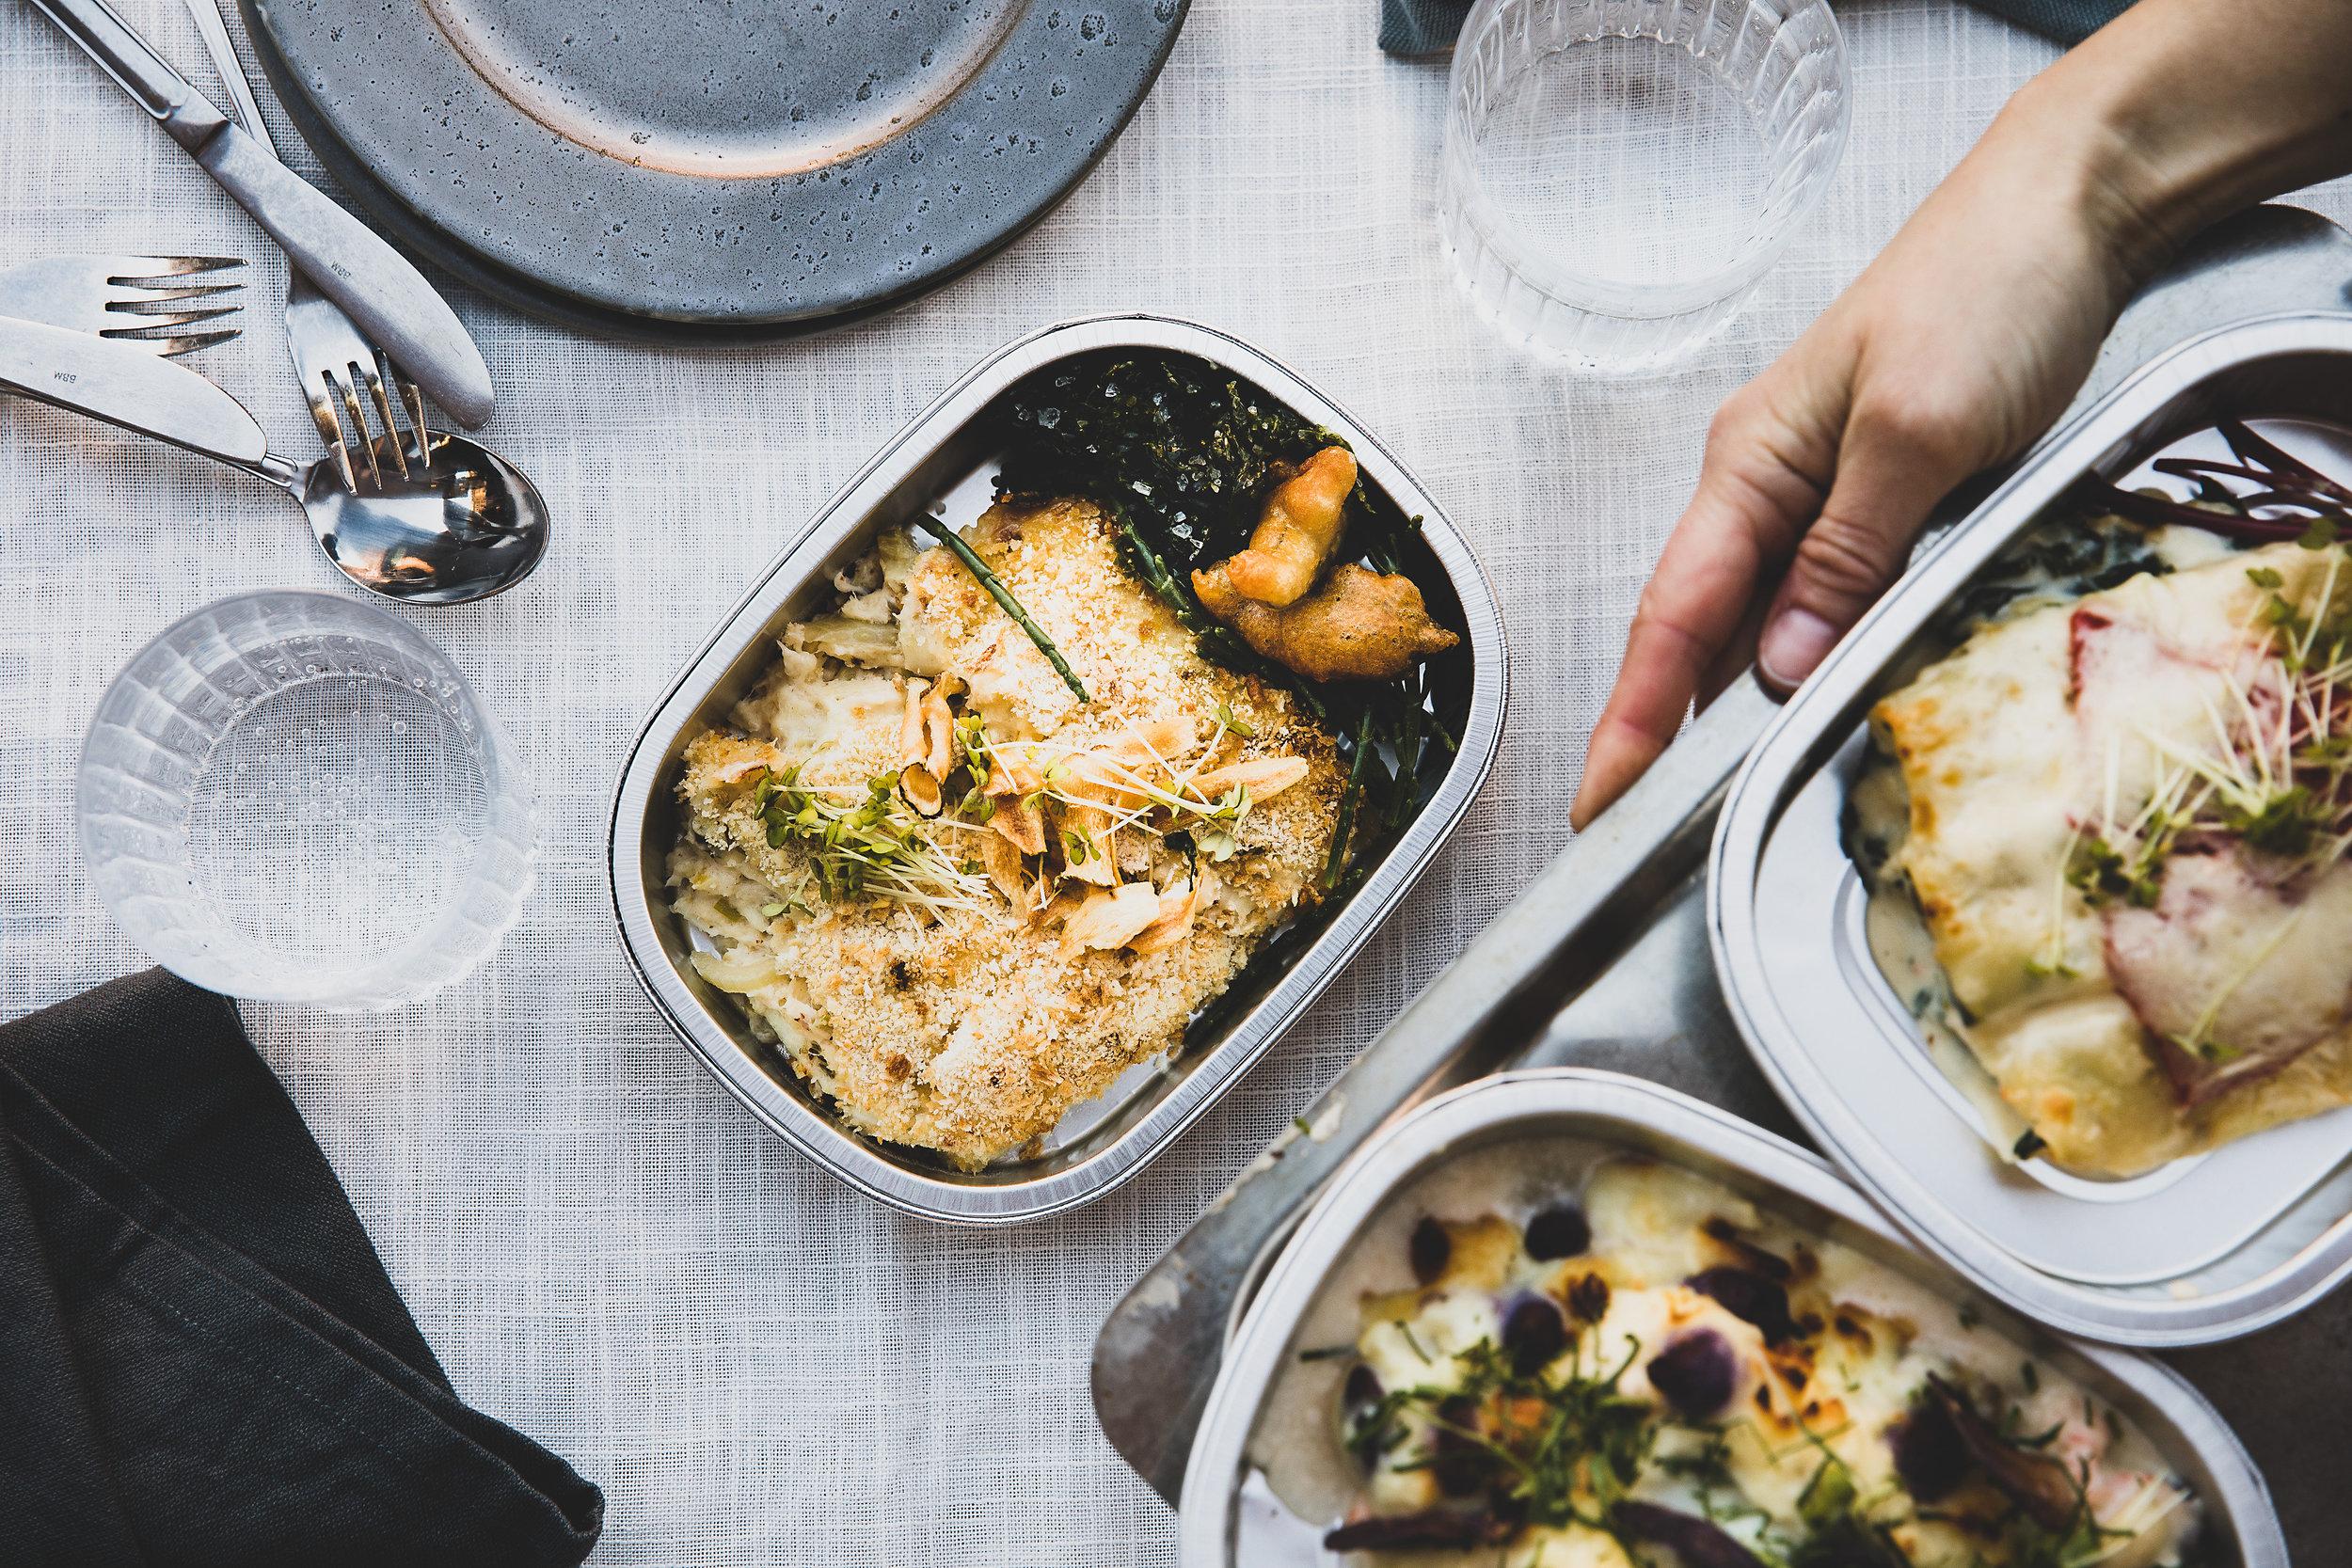 Fiskegrateng - Klassisk fiskegrateng uten makaroni. Masse fisk i hvit saus, med purre og fennikel.69 kr/per pers